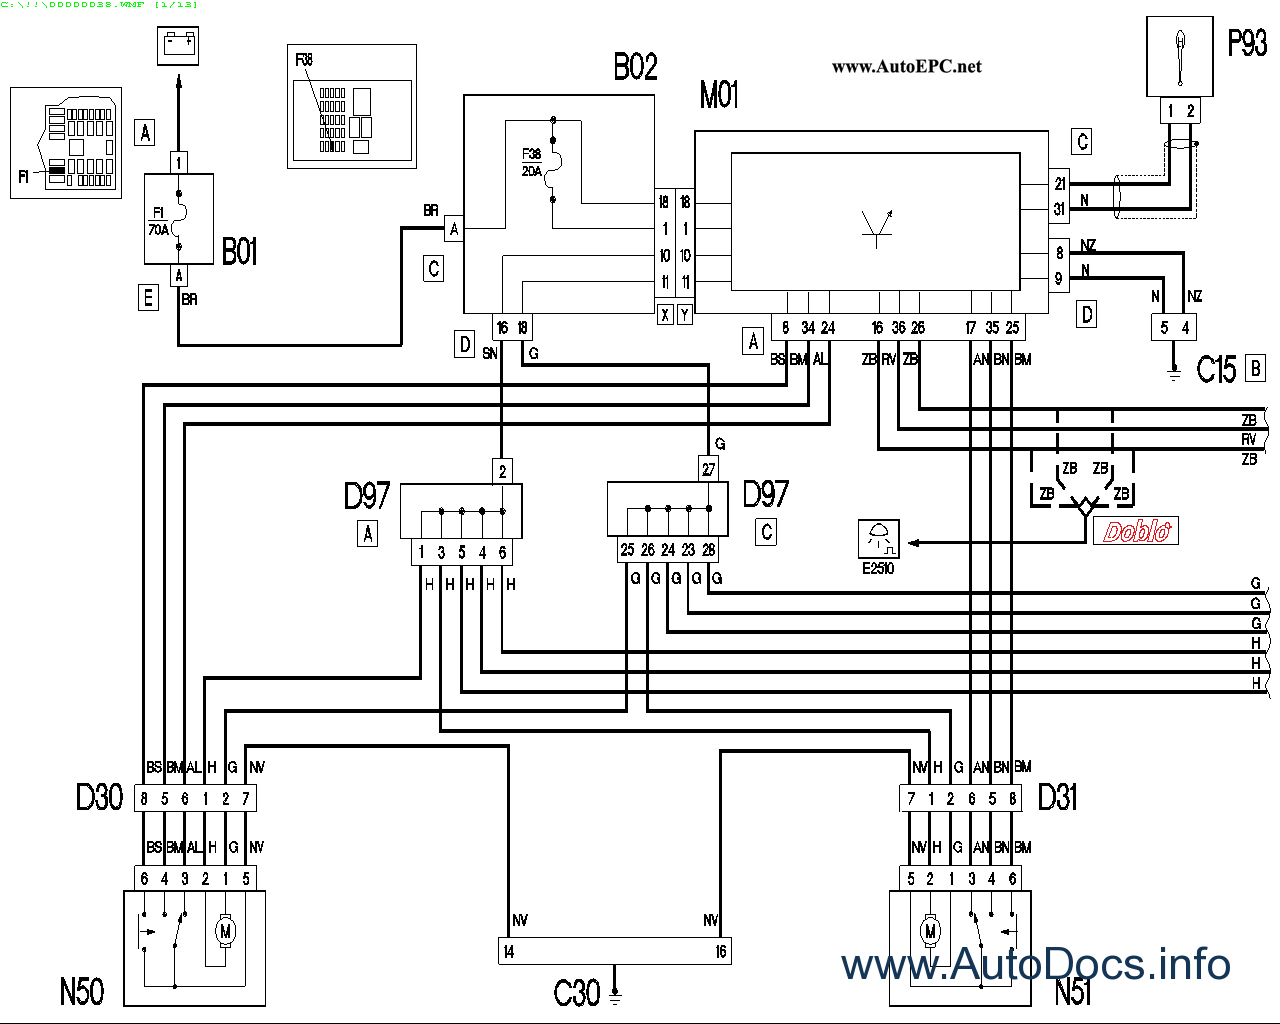 fiat doblo 1 9 jtd wiring diagram diy wiring diagrams \u2022 fiat spyder wiring remarkable fiat doblo wiring diagram manual gallery best image rh binvm us fiat brava 1 9 jtd